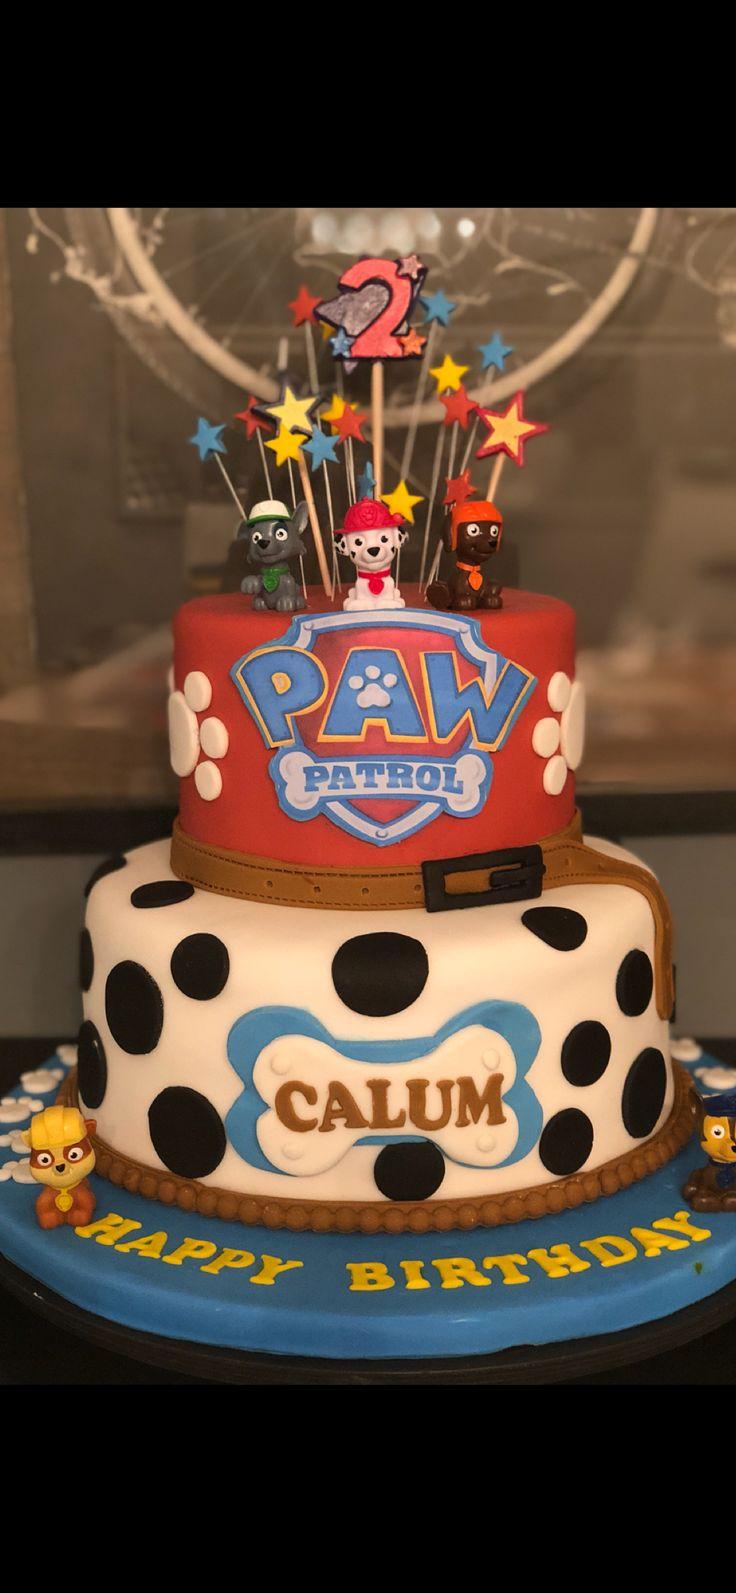 Best Birthday Cake In Ottawa